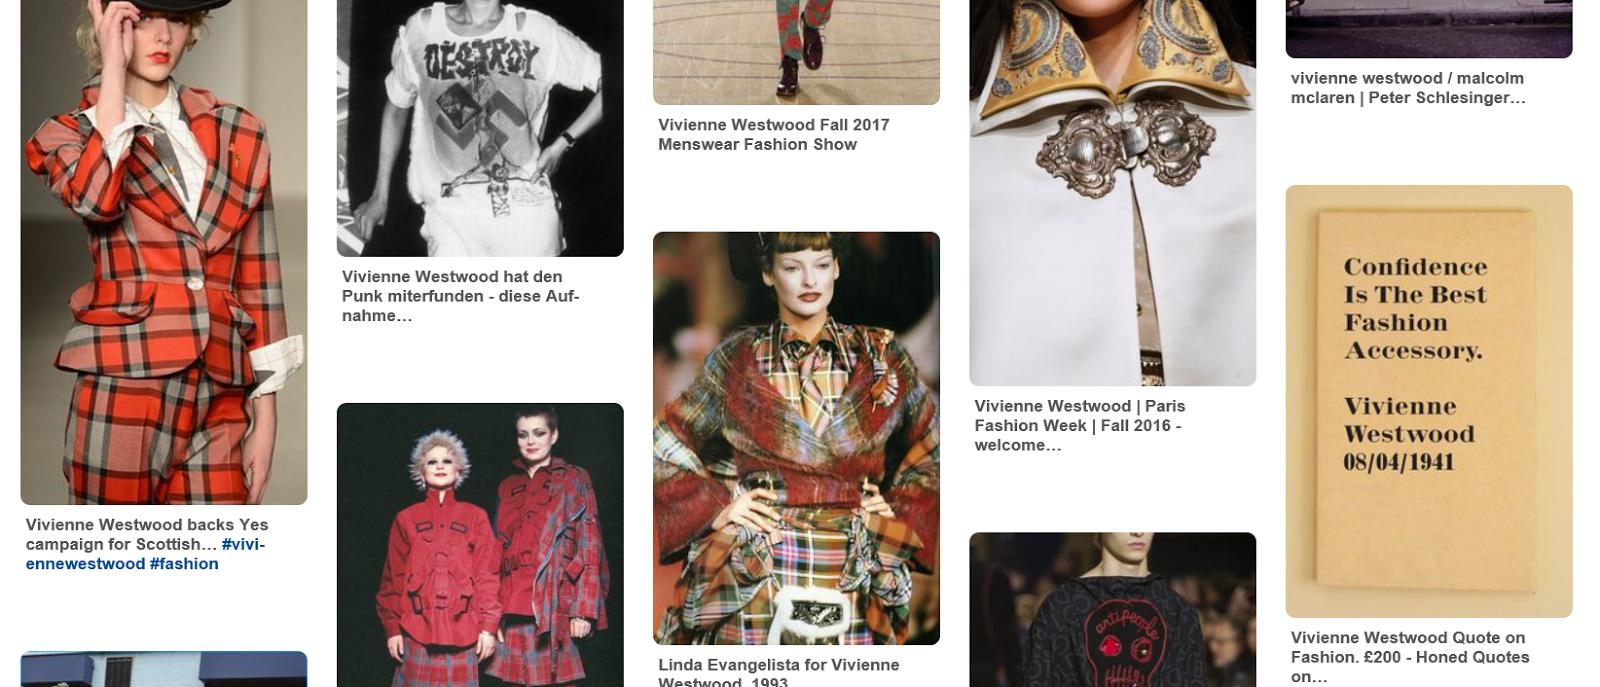 https://www.pinterest.de/yourlookinlife/vivienne-westwood-fashion-designer/